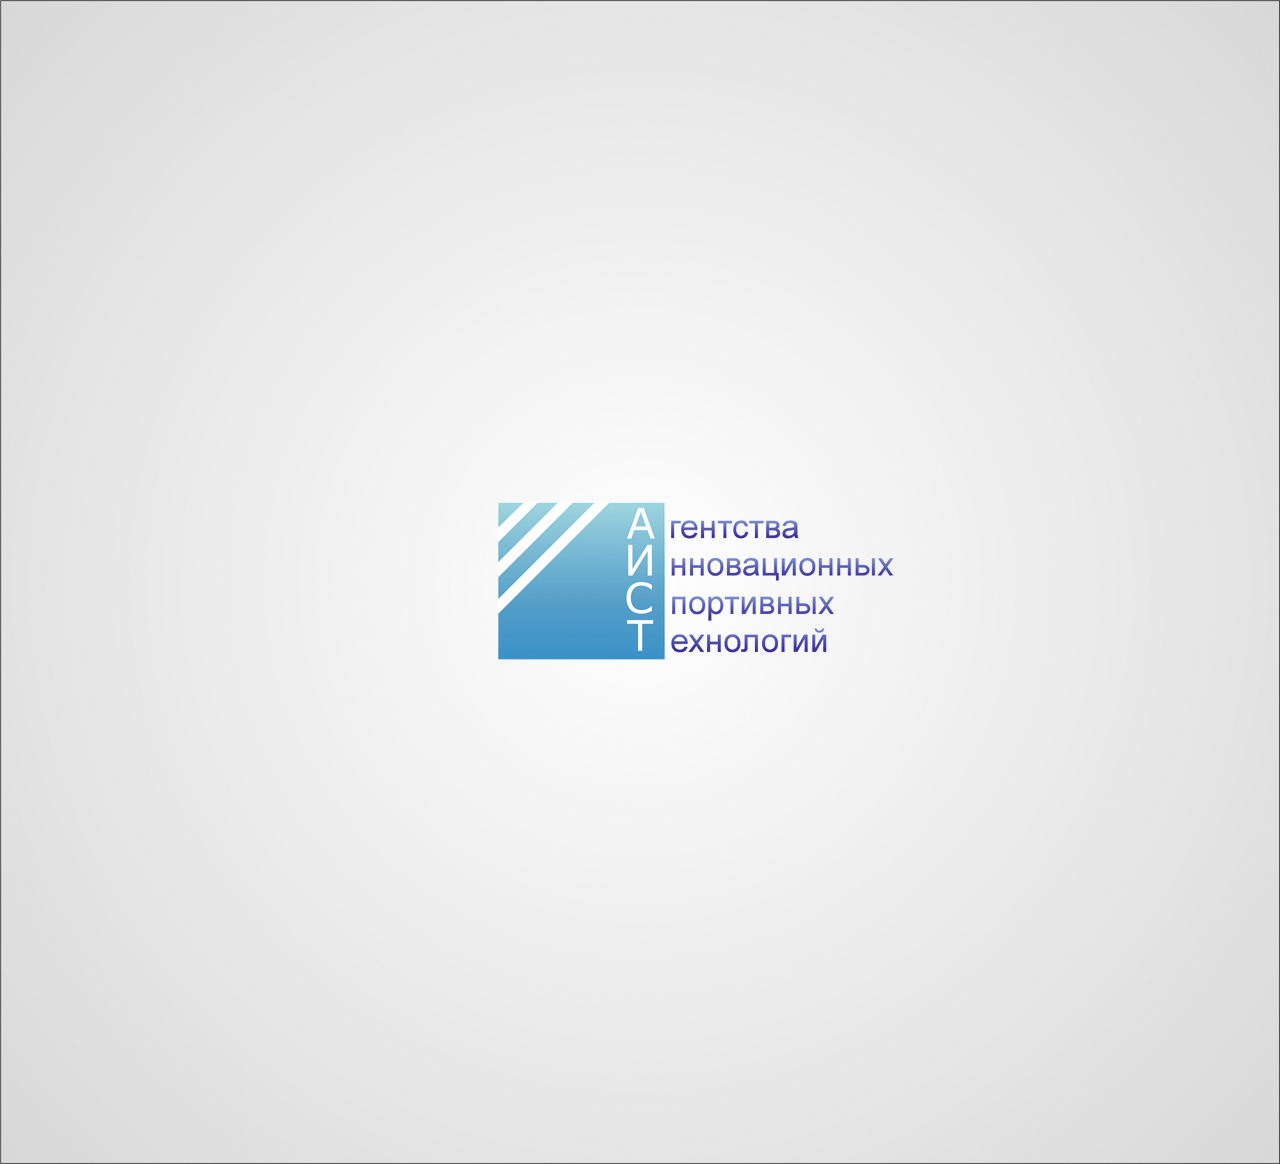 Лого и фирменный стиль (бланк, визитка) фото f_208517fe24a7f018.jpg